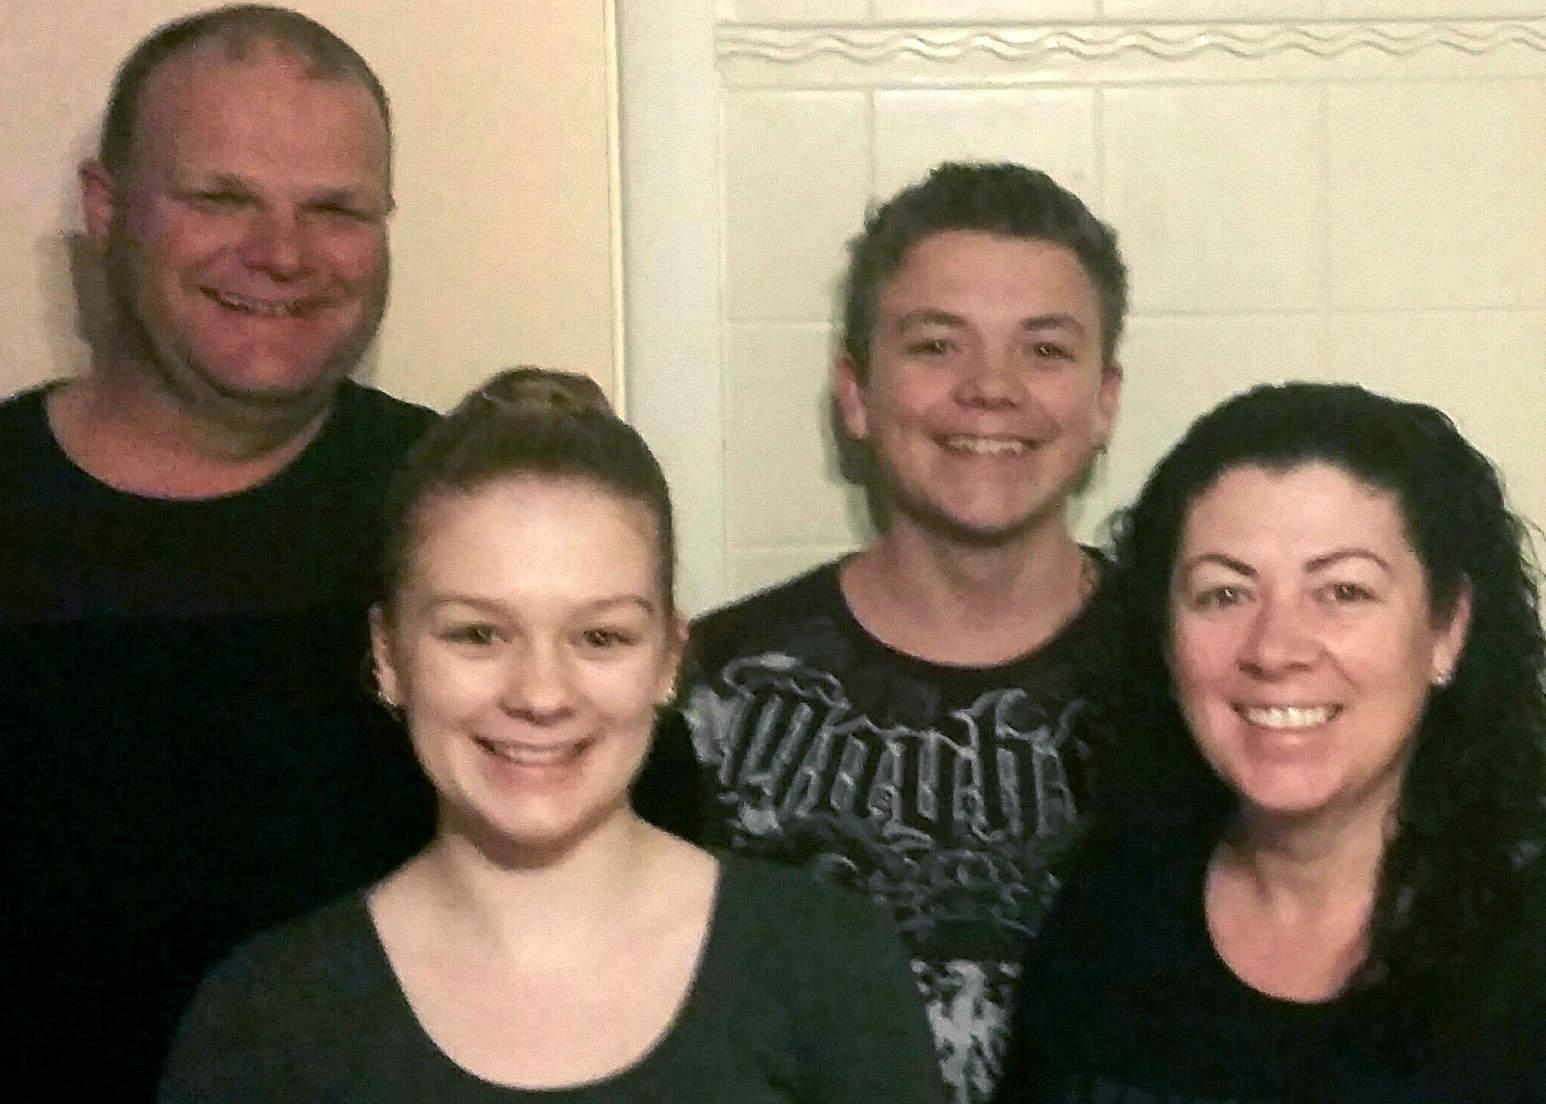 Hubbard family - Hume 5x7